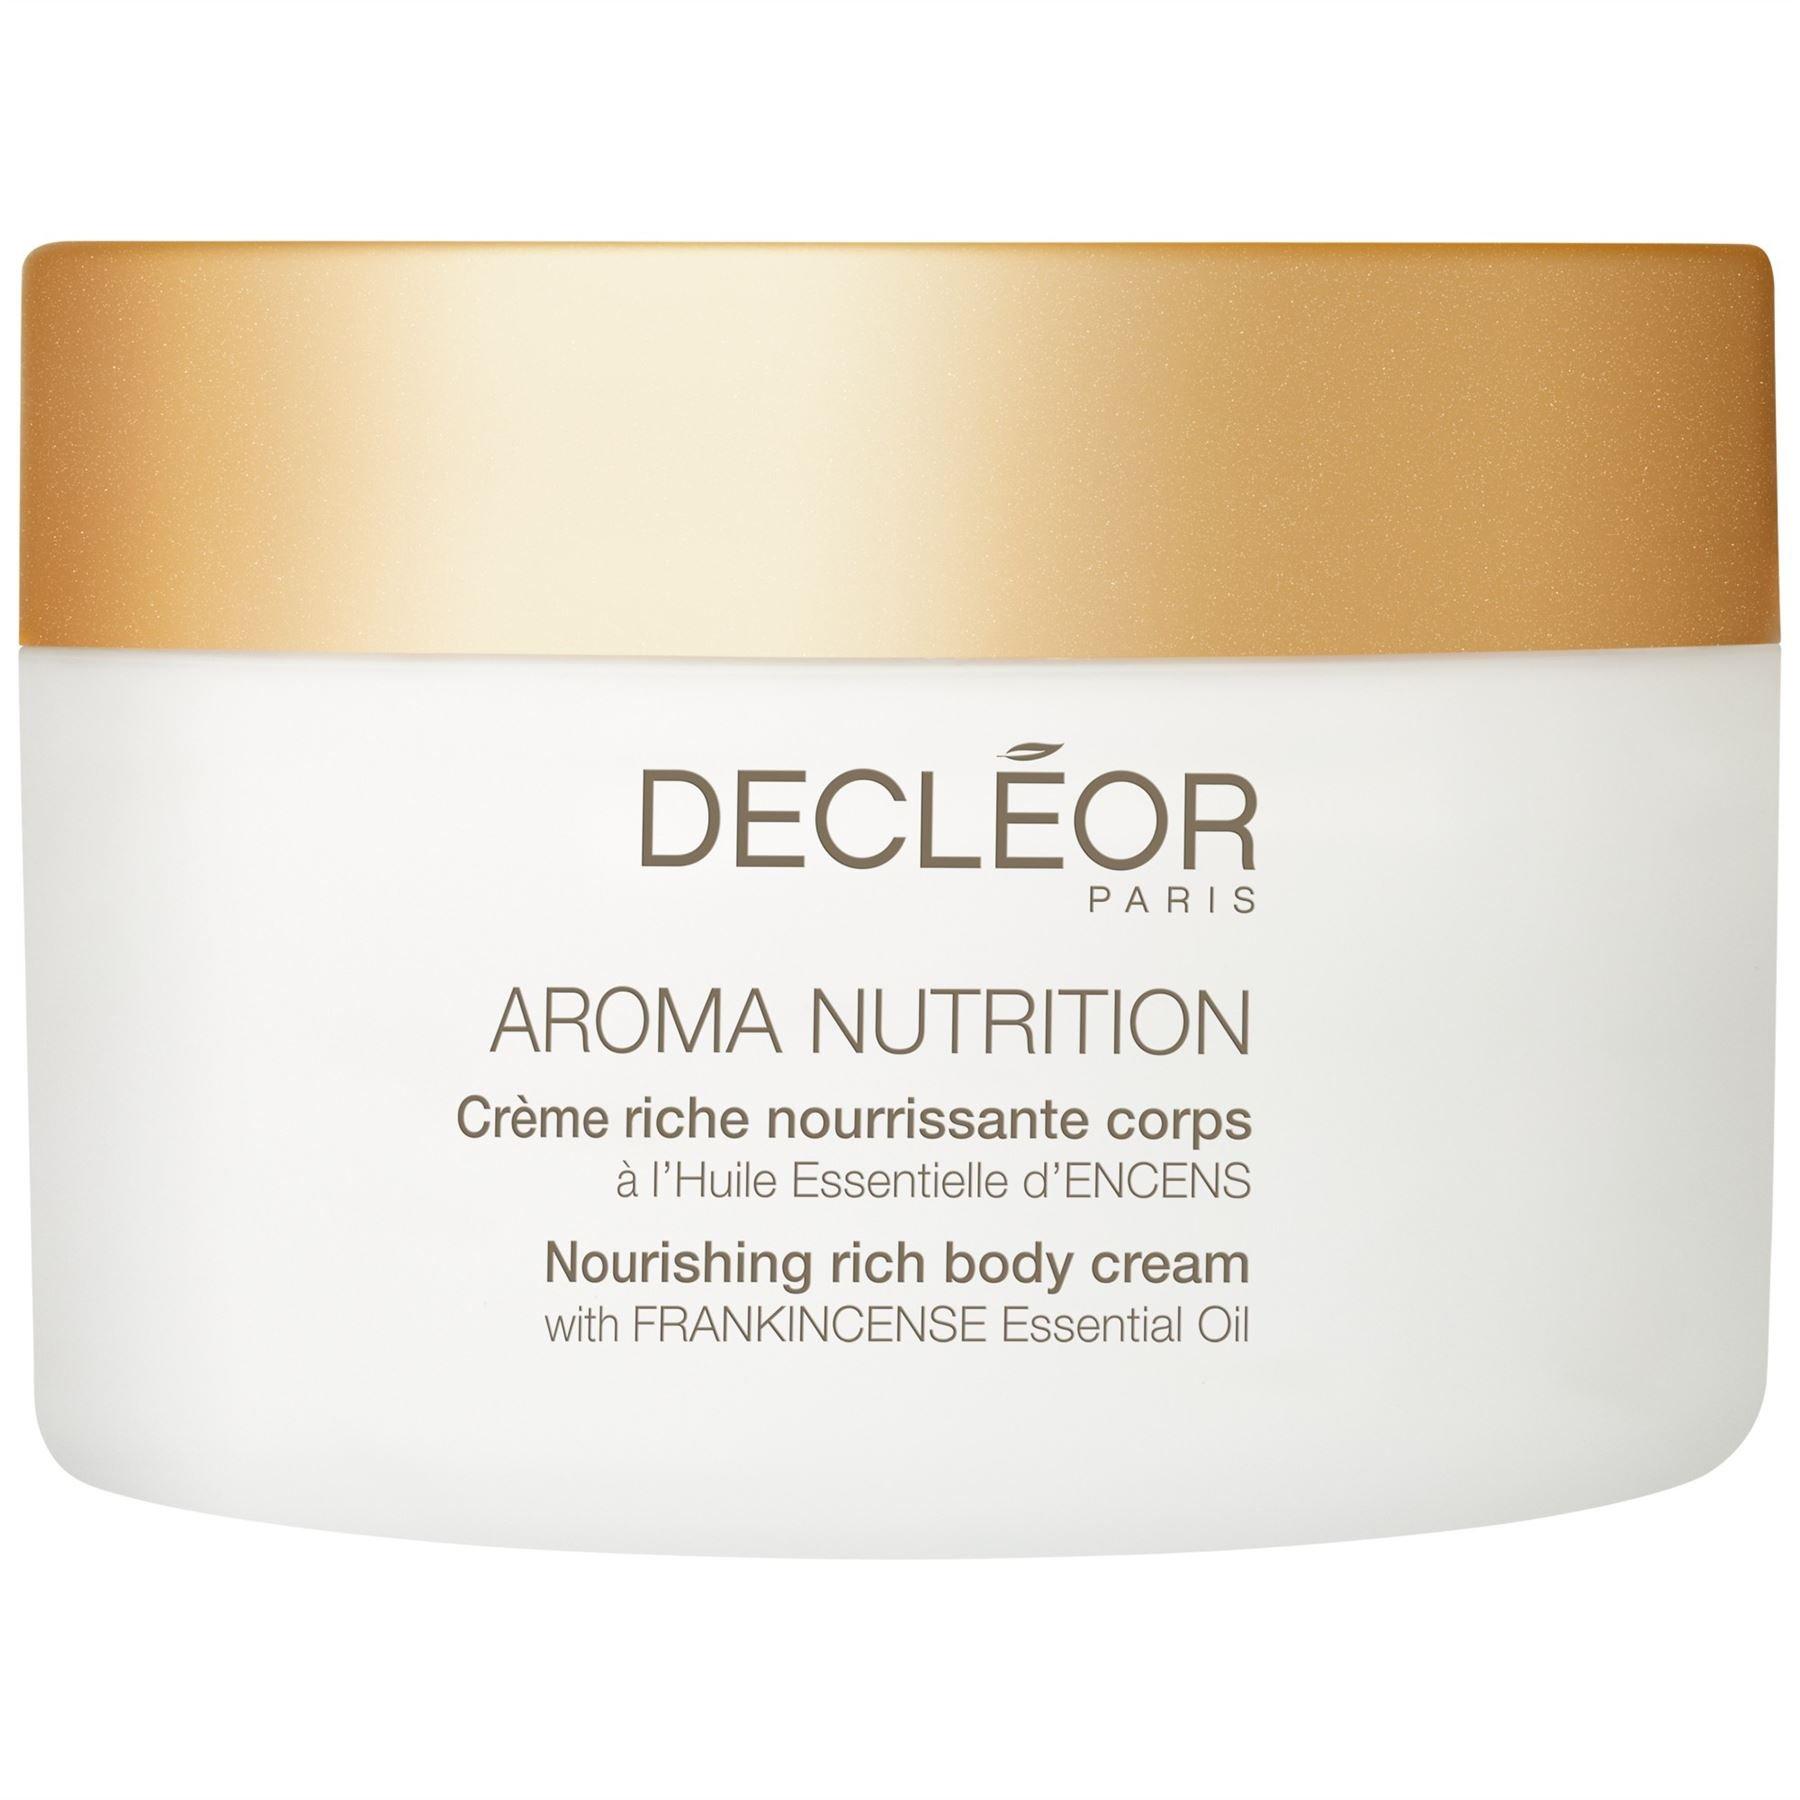 Decléor Aroma Nutrition Nourishing Rich Body Cream 100ml - Pack of 2